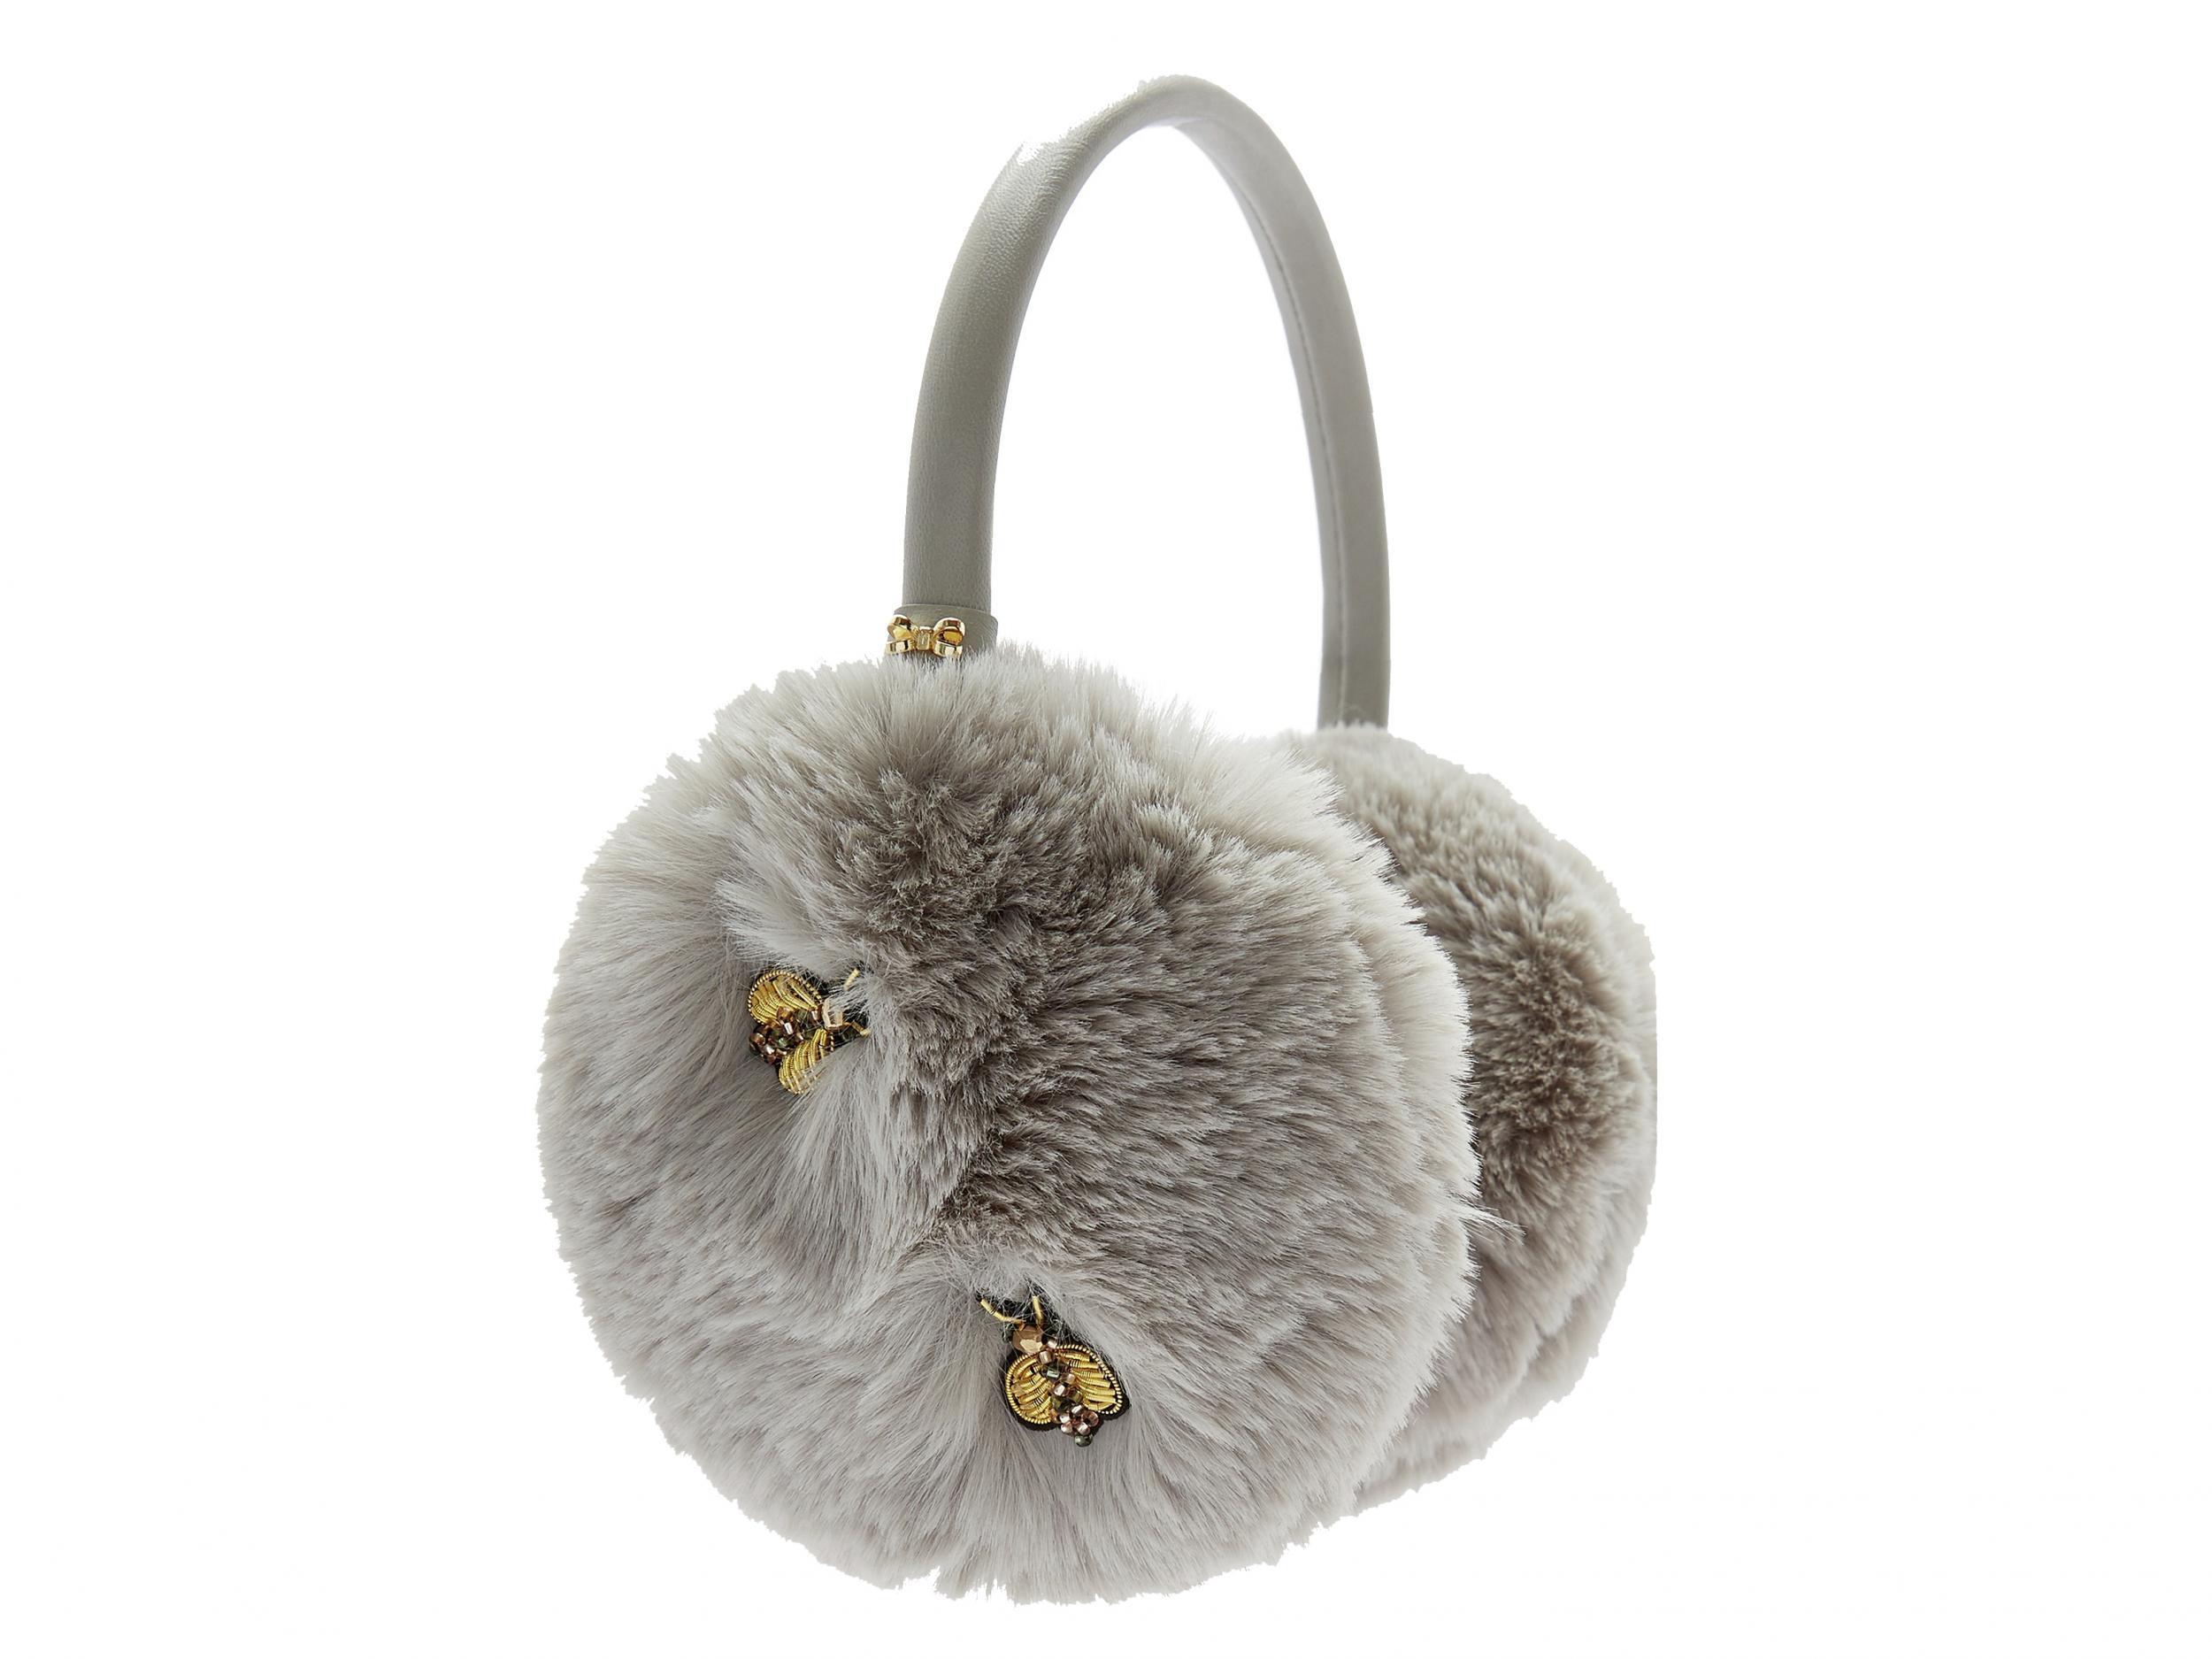 Circular Slight Cold Twenty Four Solar Term Winter Earmuffs Ear Warmers Faux Fur Foldable Plush Outdoor Gift